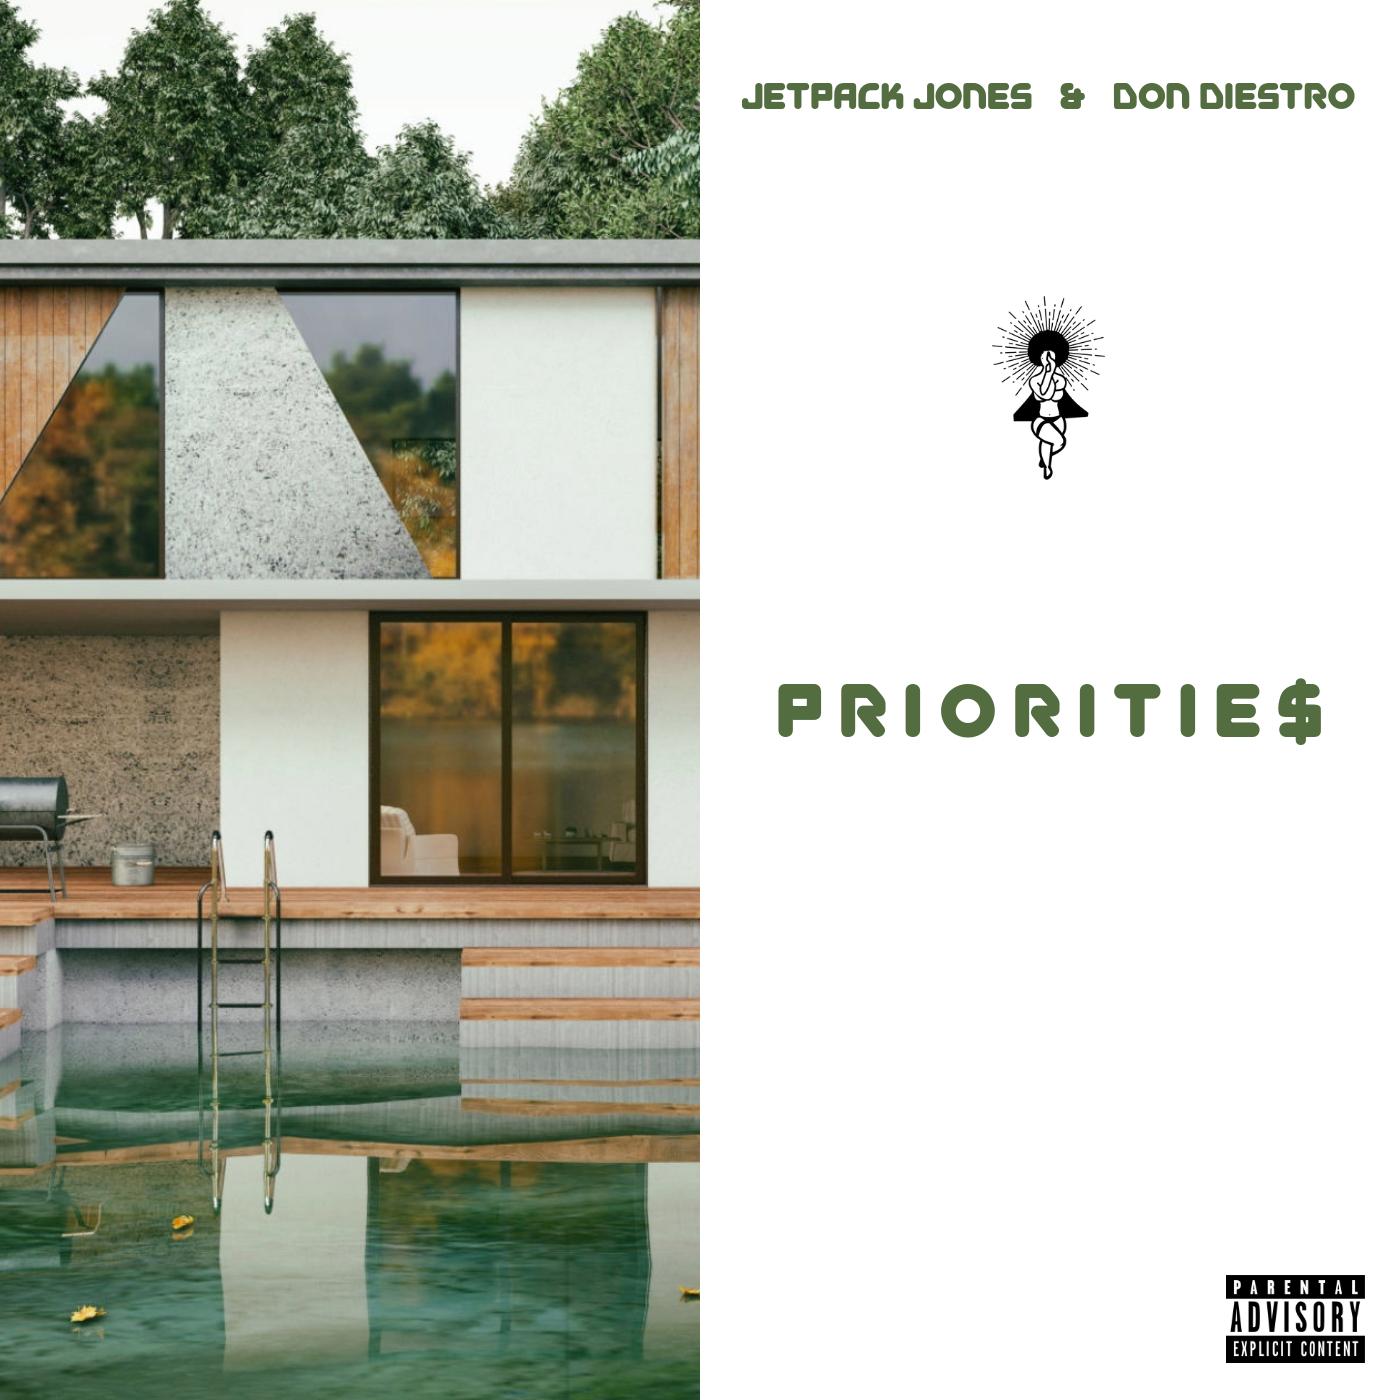 Priorities (4).png